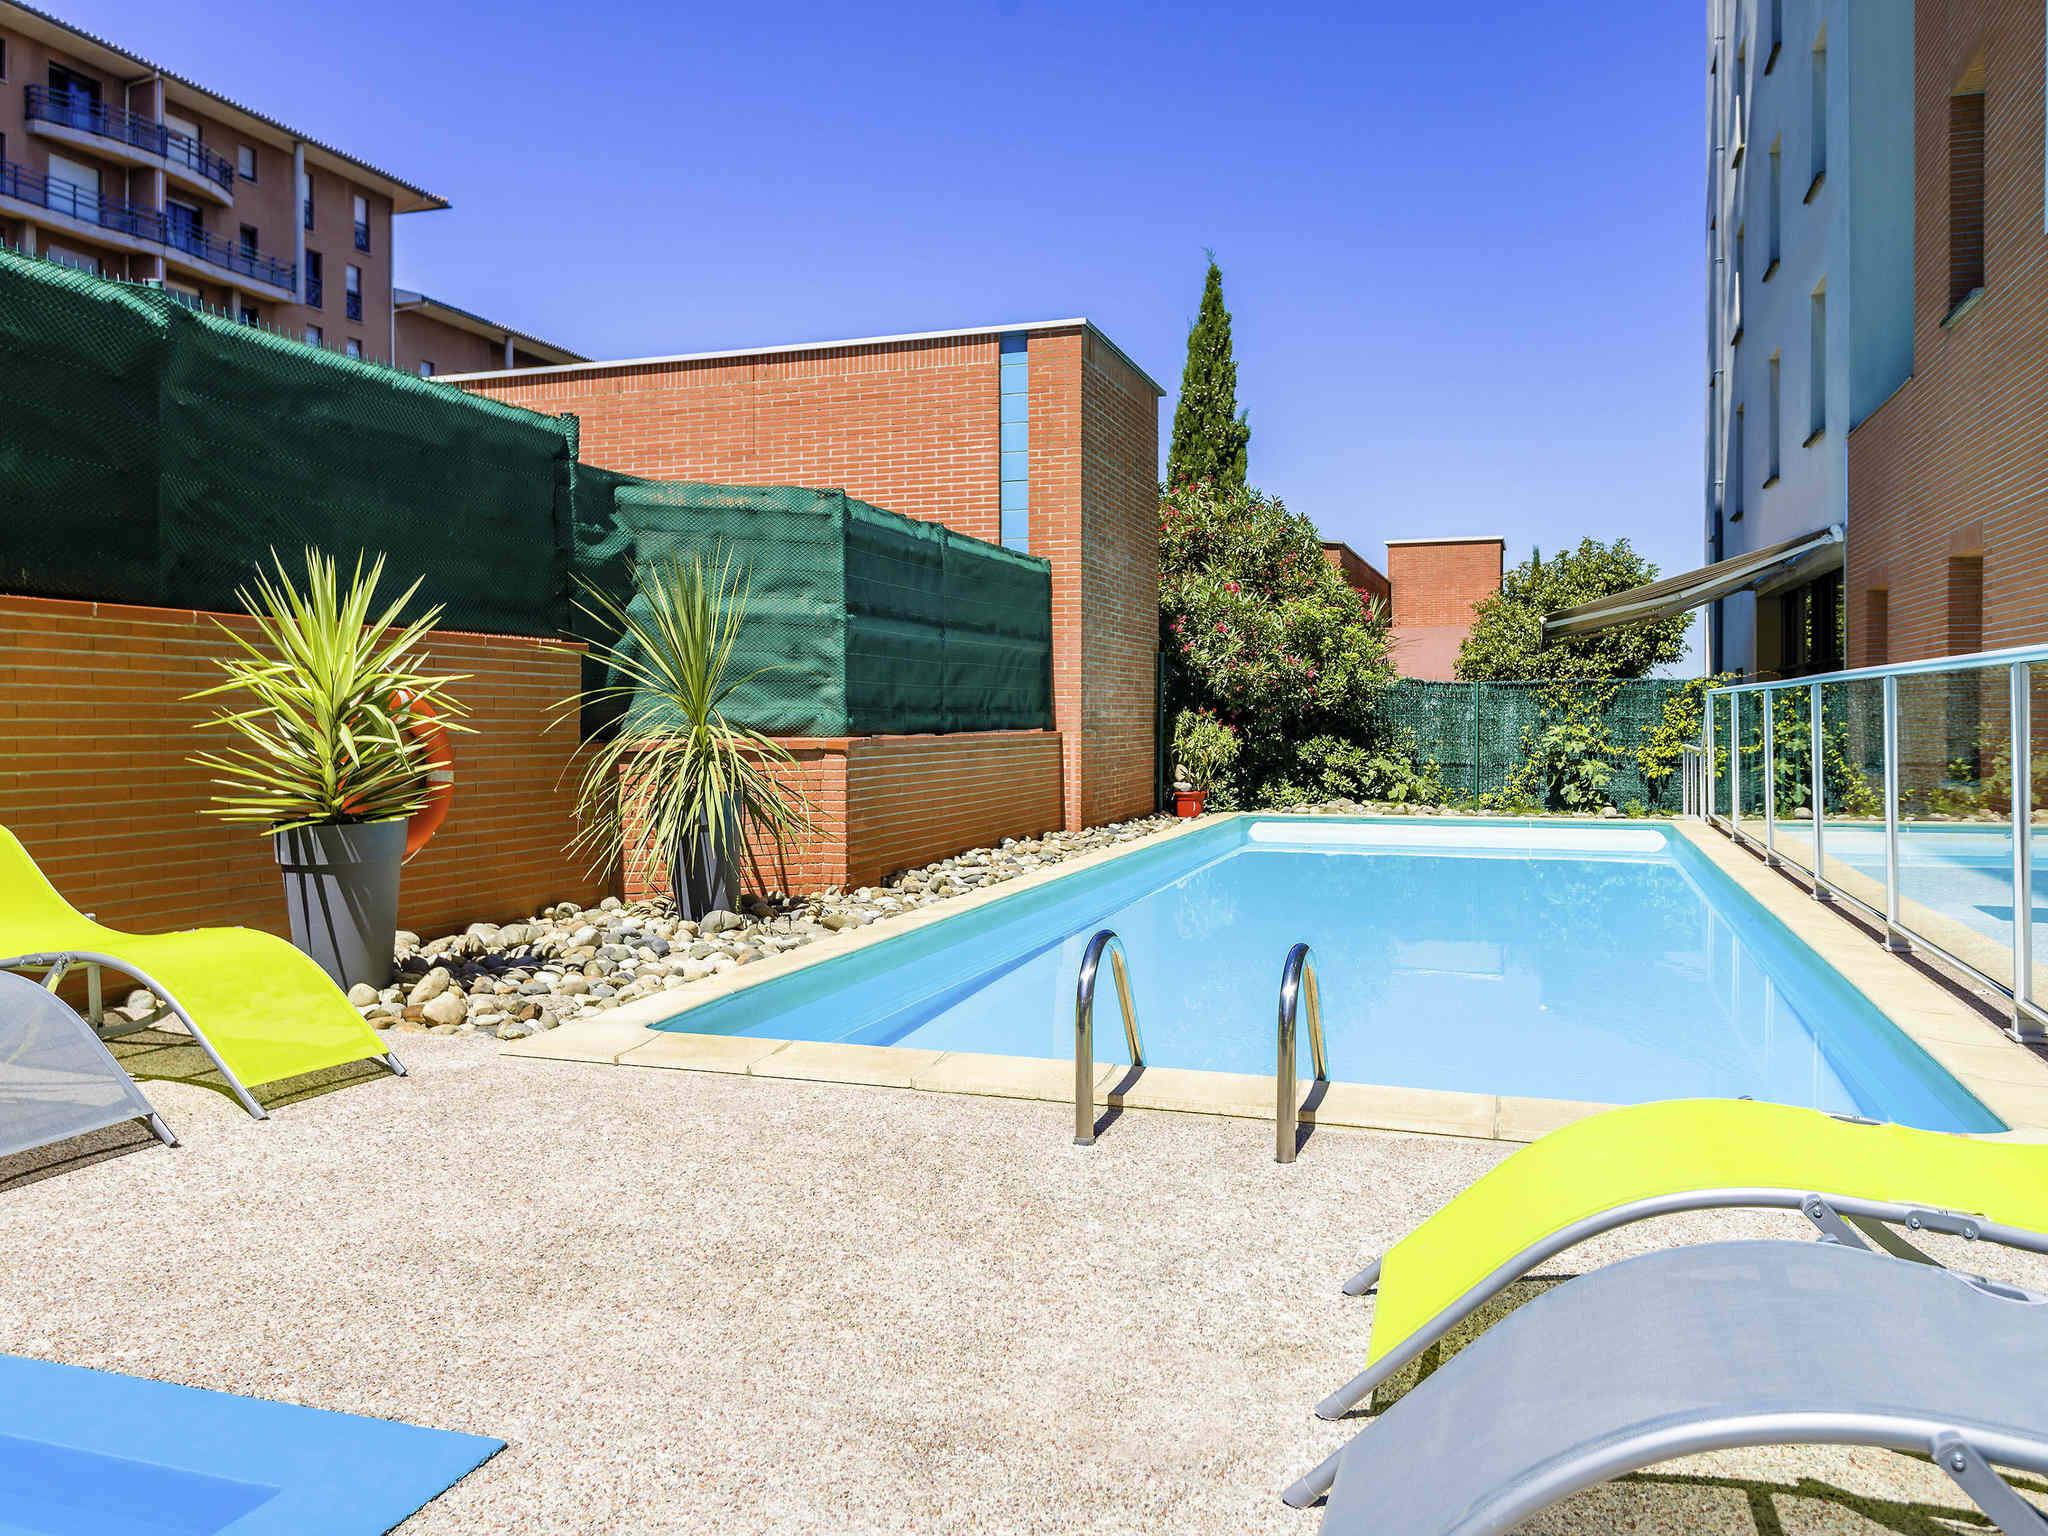 Hotel - Aparthotel Adagio access Toulouse Jolimont